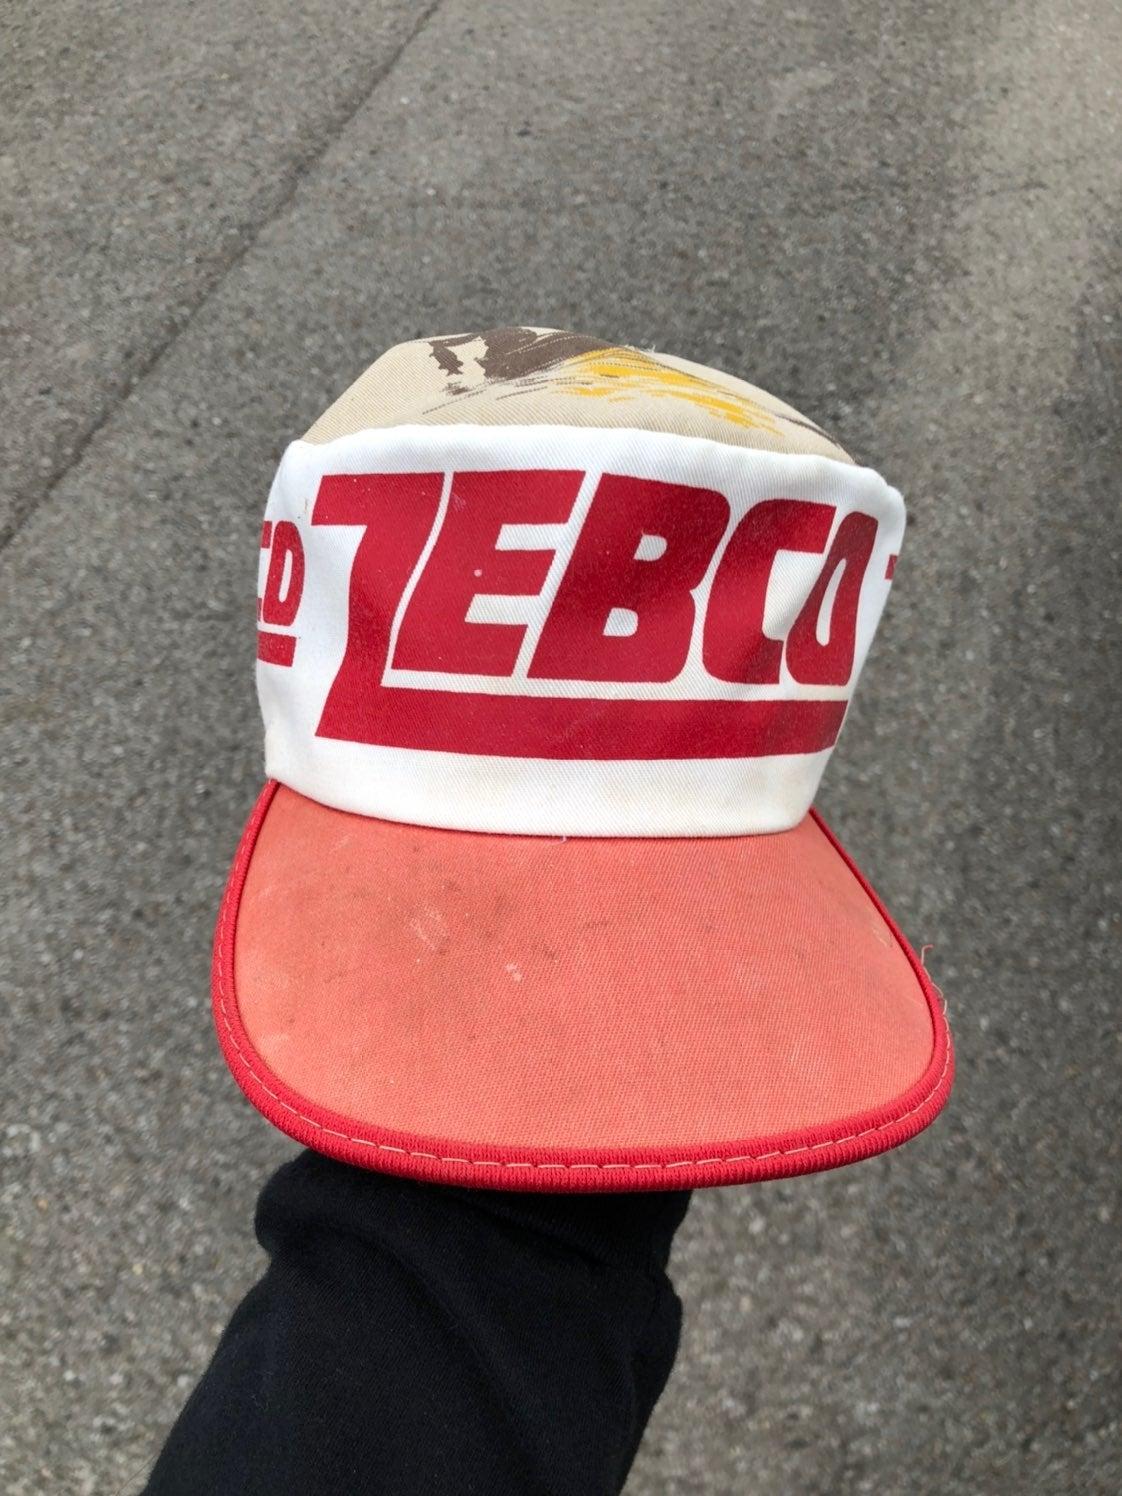 Vintage Zebco Fishing Hat